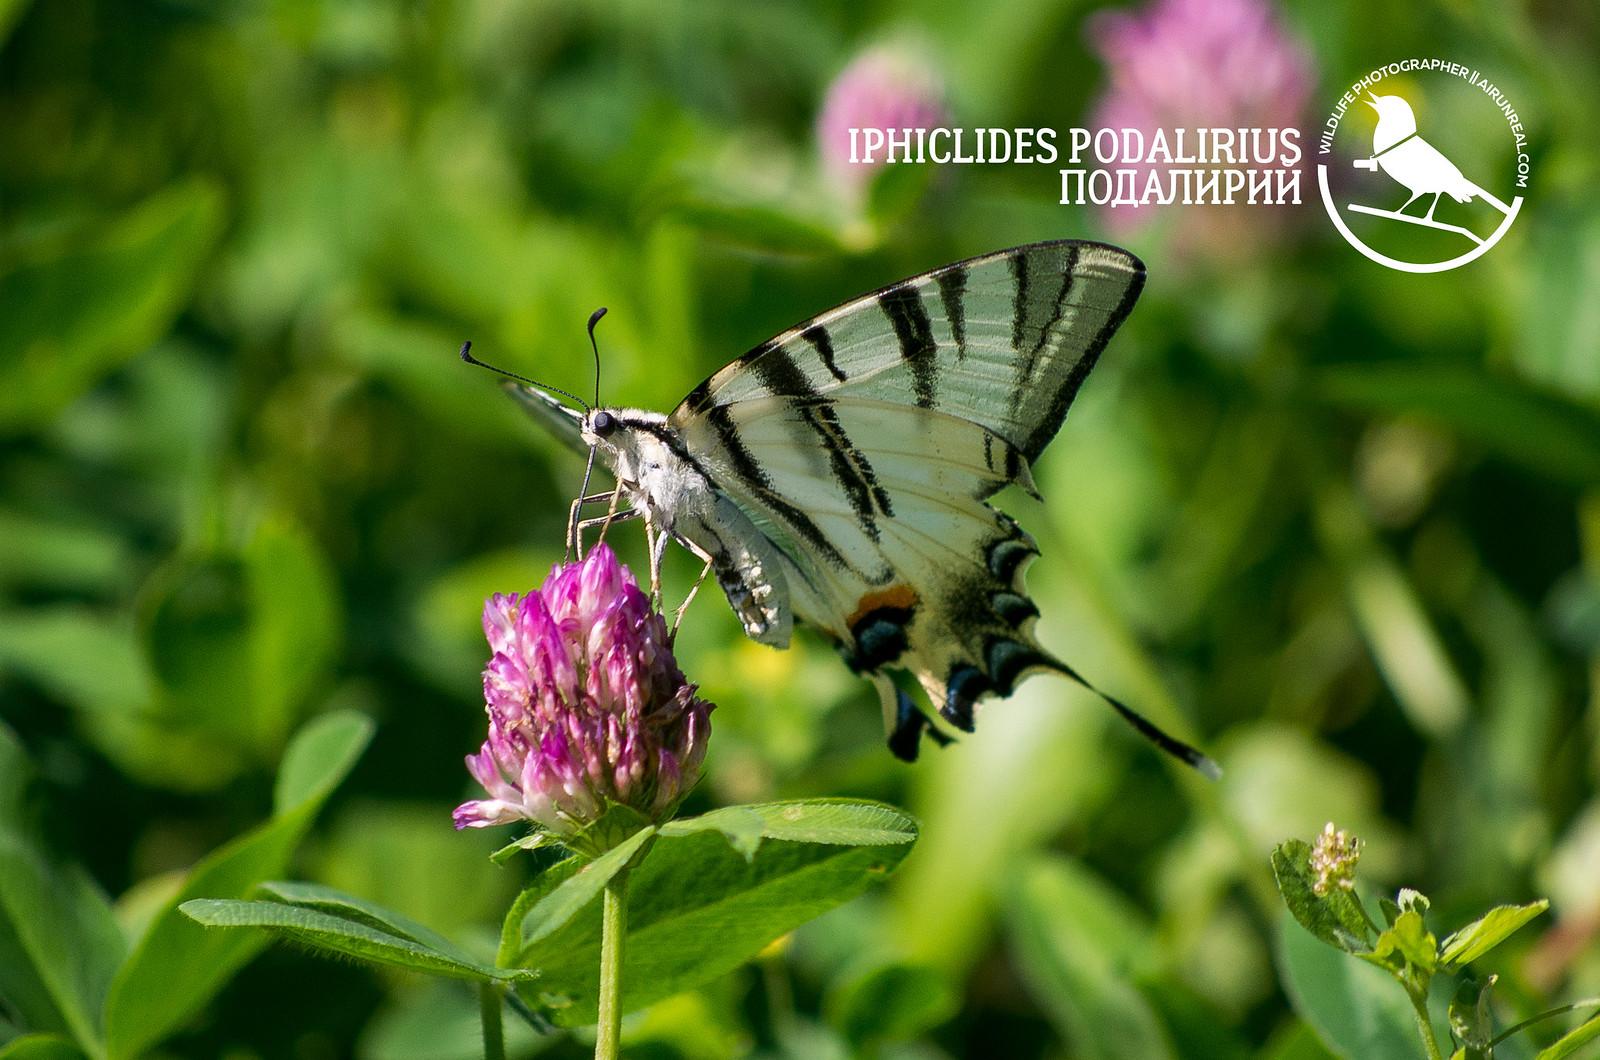 Iphiclides podalirius // 20170530